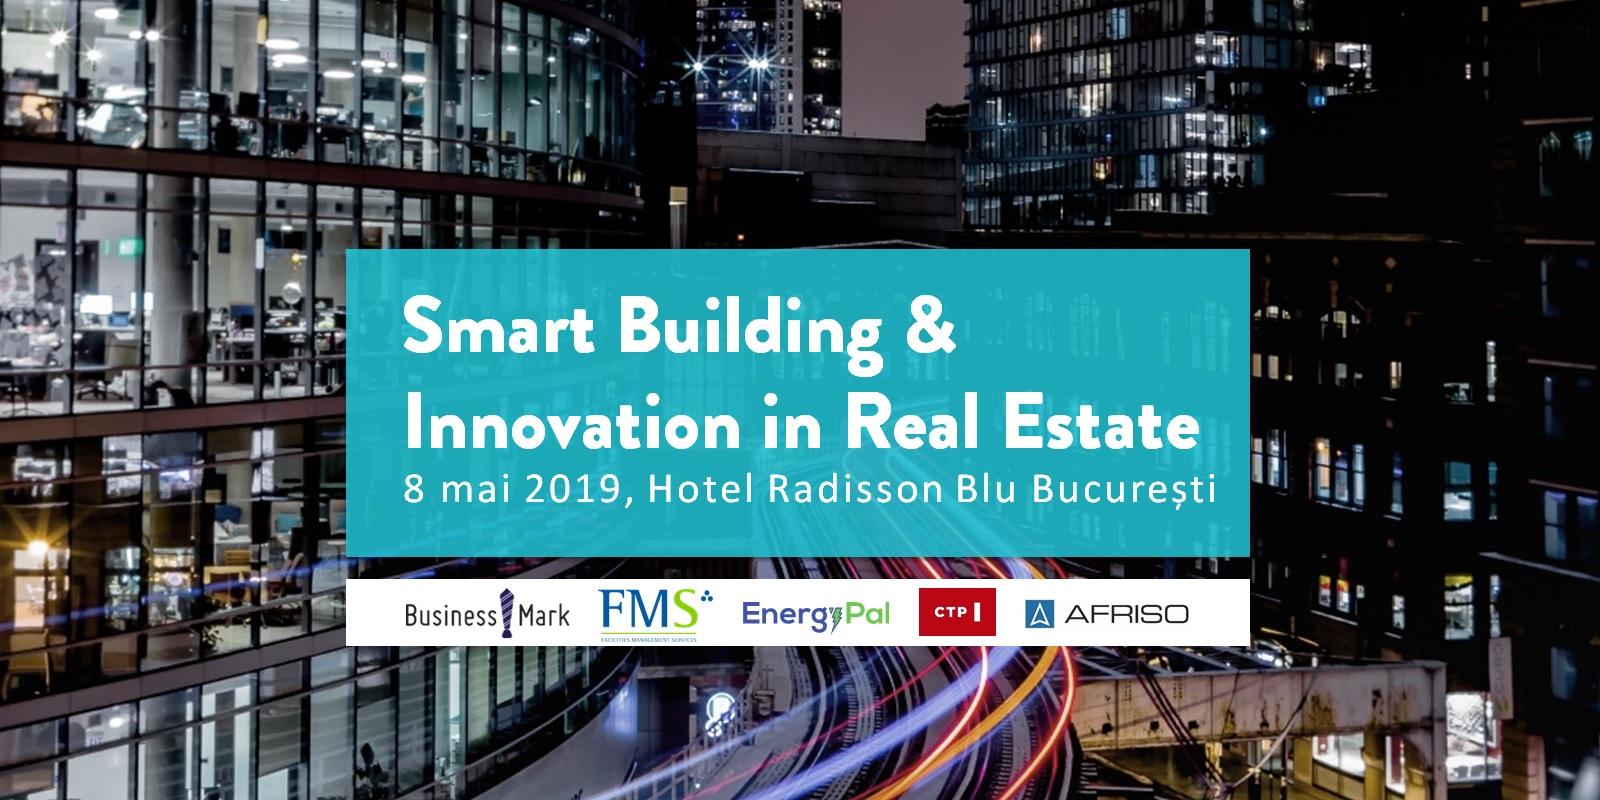 Inovatia tehnologica si cladirile smart din ce in ce mai des intalnite in industria Real Estate